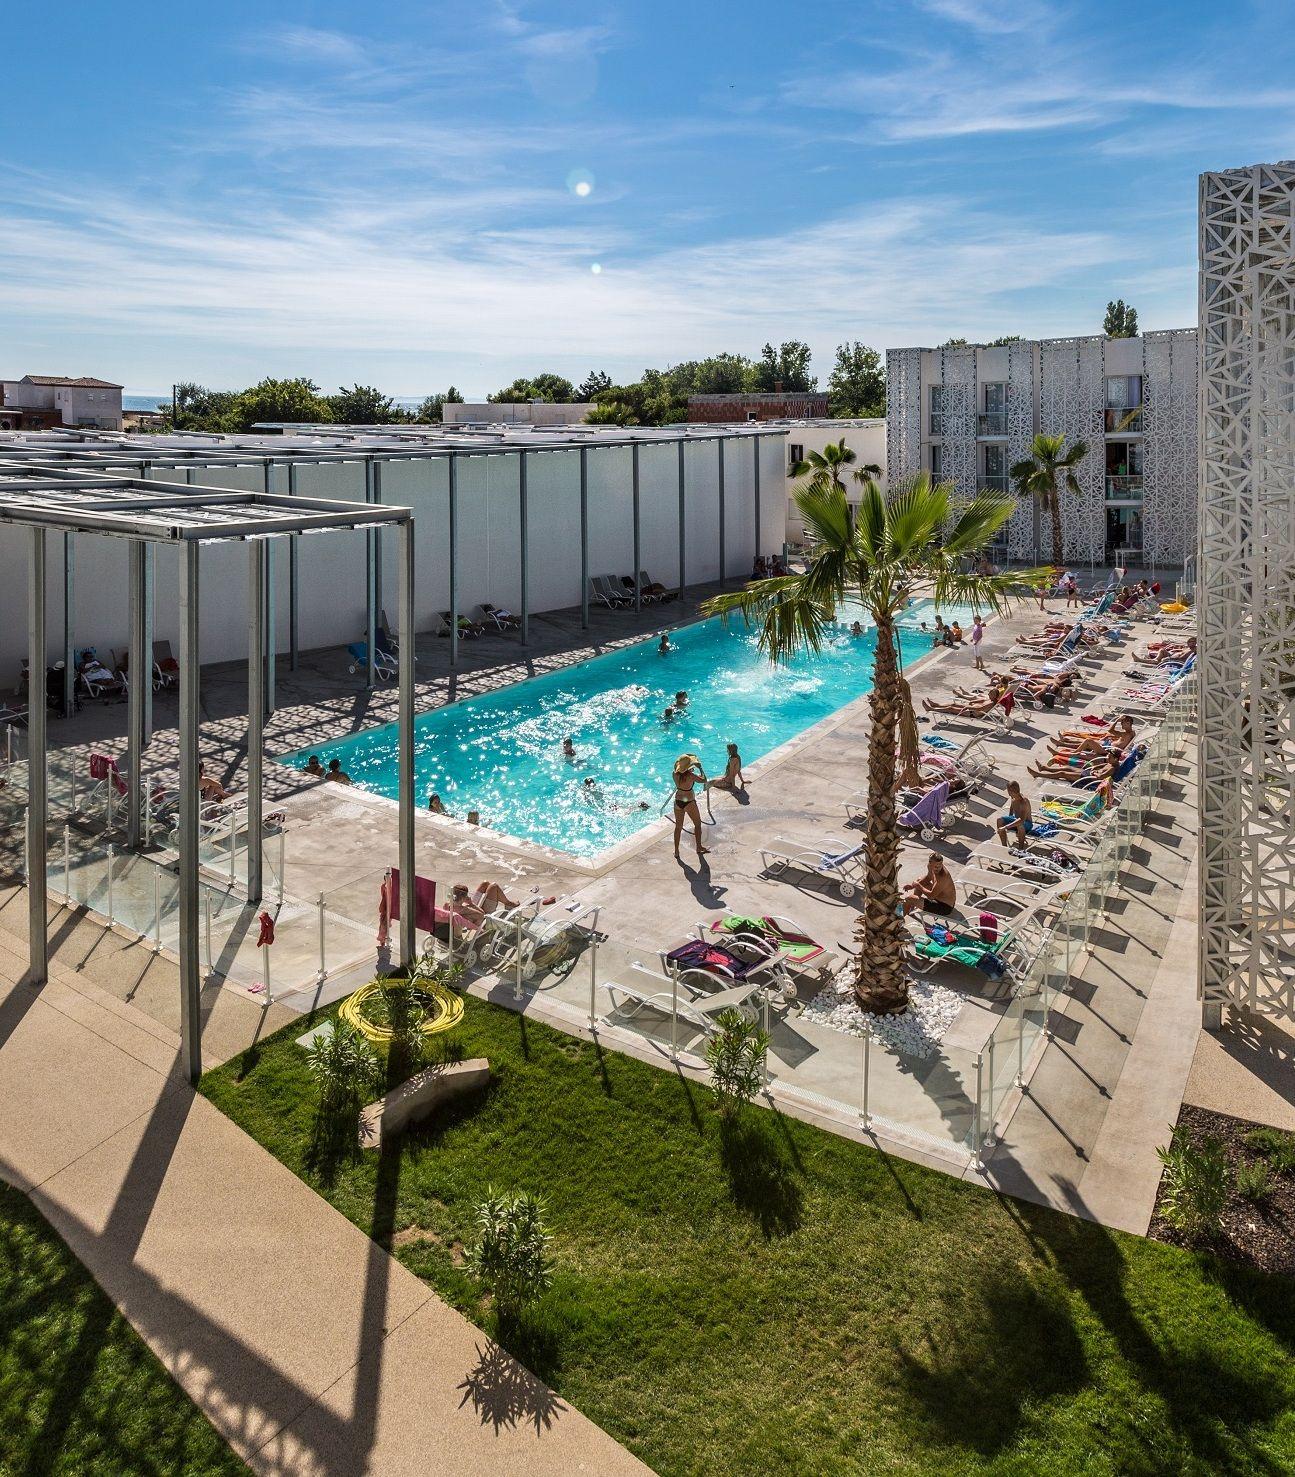 Nak%C3%A2ra piscine - Dentelle de béton pour la résidence Nakâra